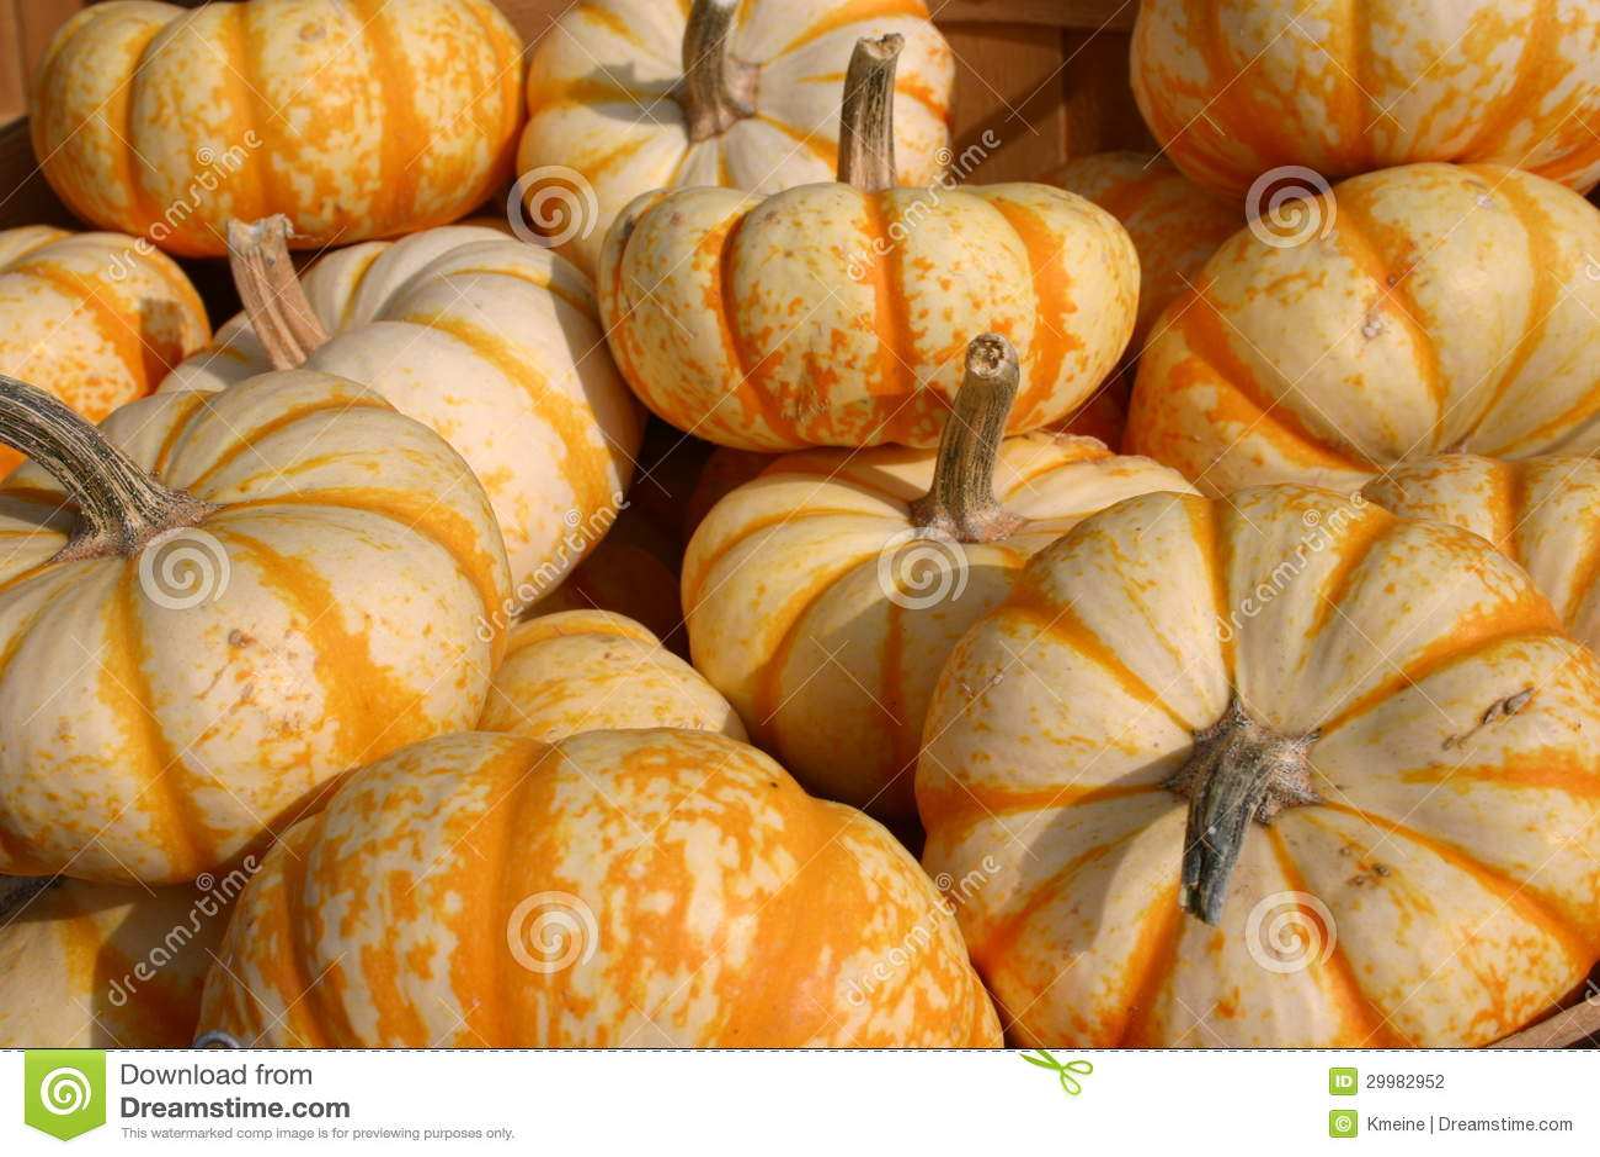 Fall Pumpkin Background Wallpaper Little Orange And White Pumpkins Stock Photo Image 29982952